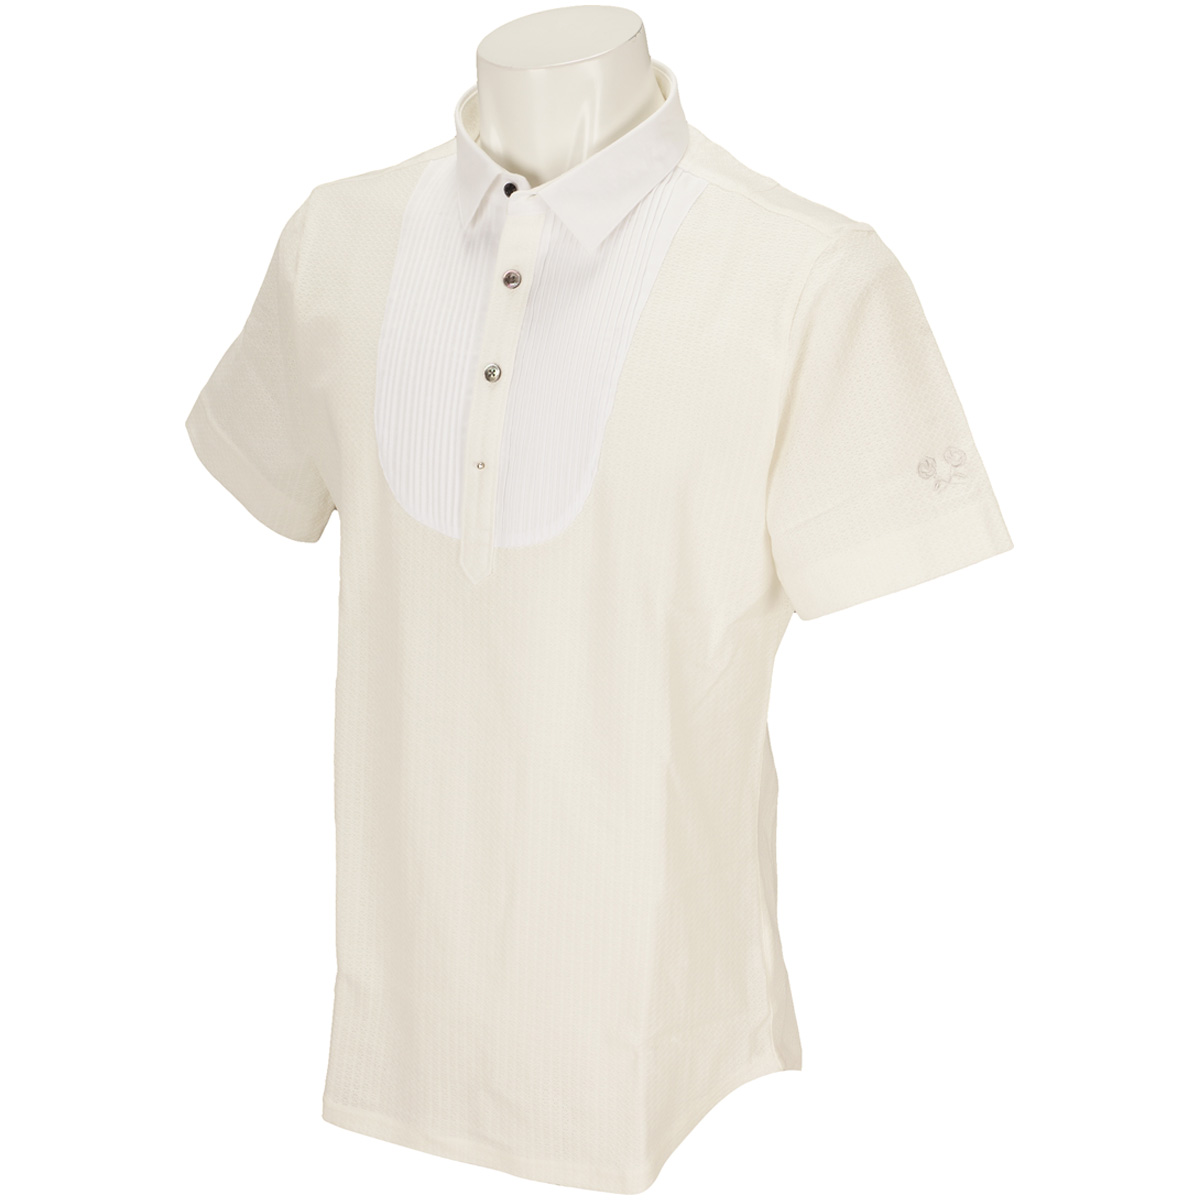 BlackLabel 半袖ポロシャツ